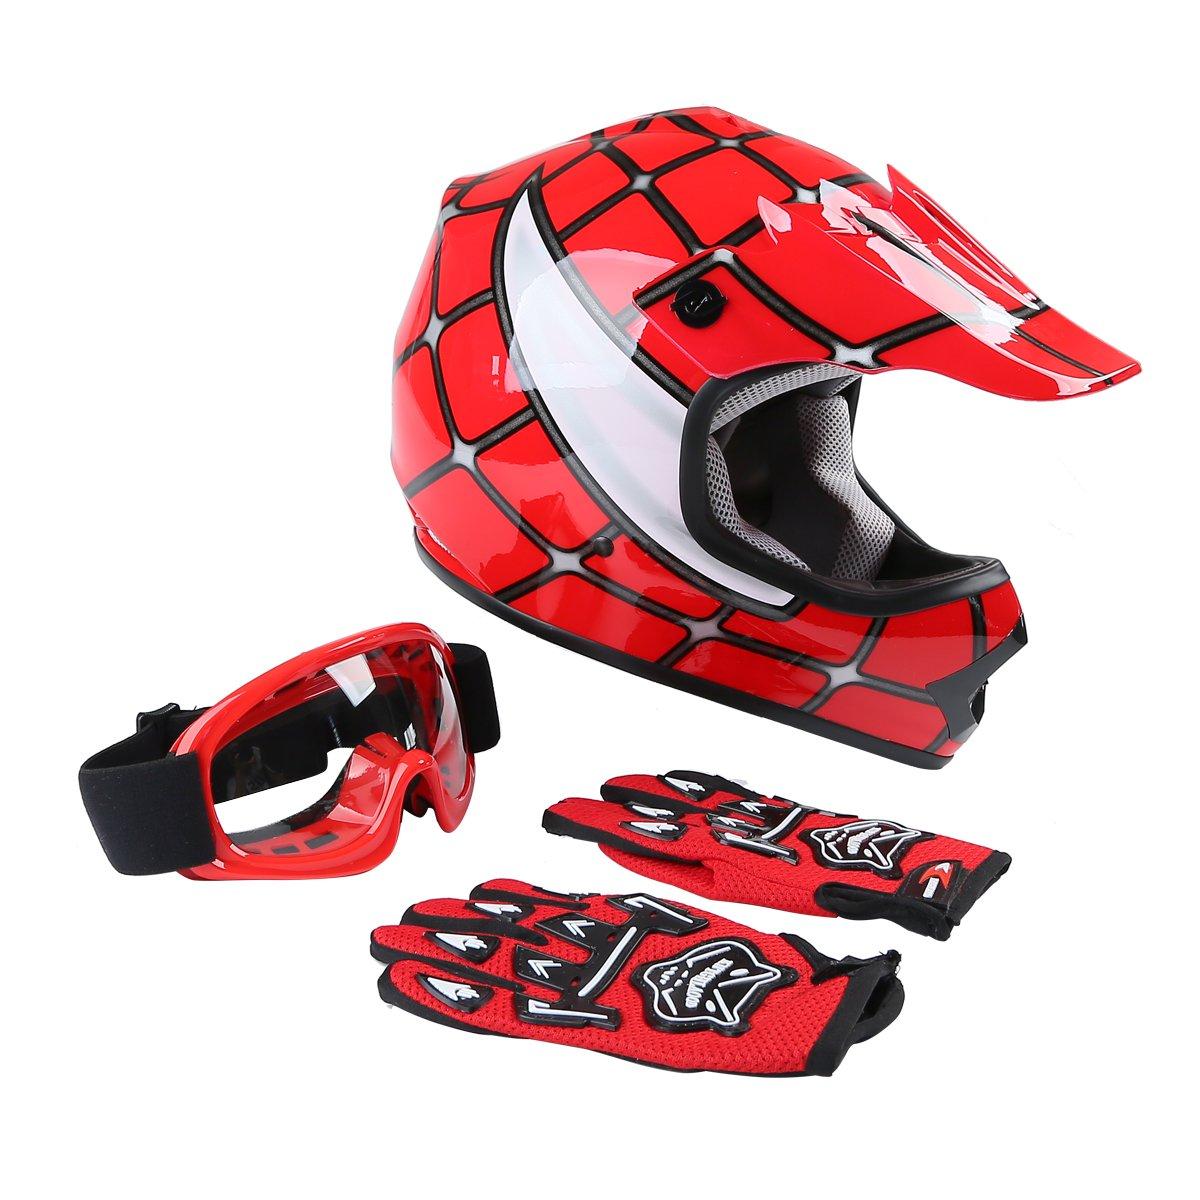 Tengchang Youth Kids Motocross Offroad Street Dirt Bike Helmet Goggles Gloves Atv Mx Helmet Red Spider